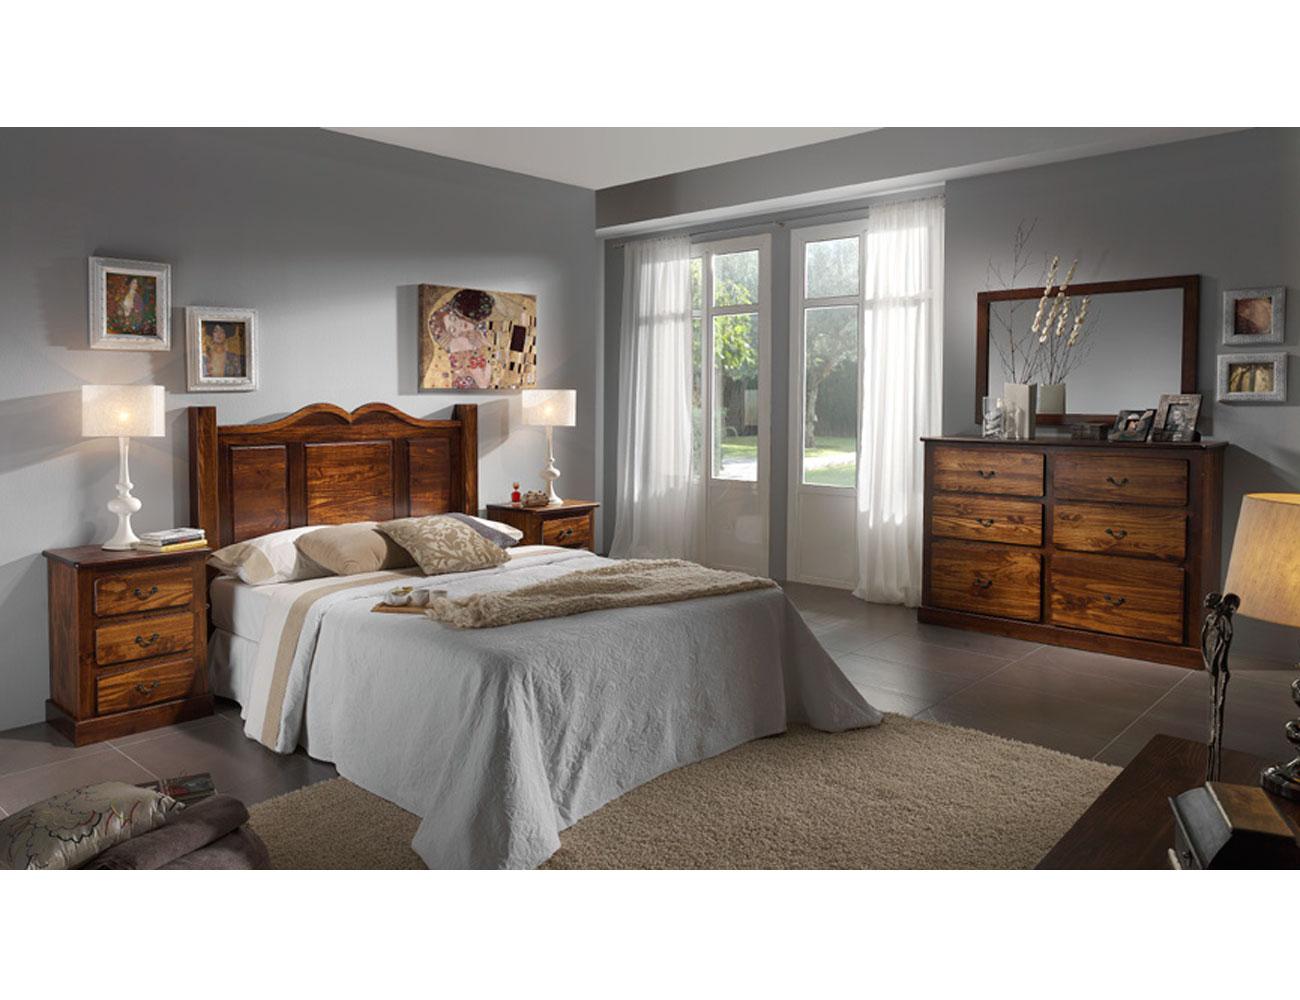 Dormitorio matrimonio comoda1